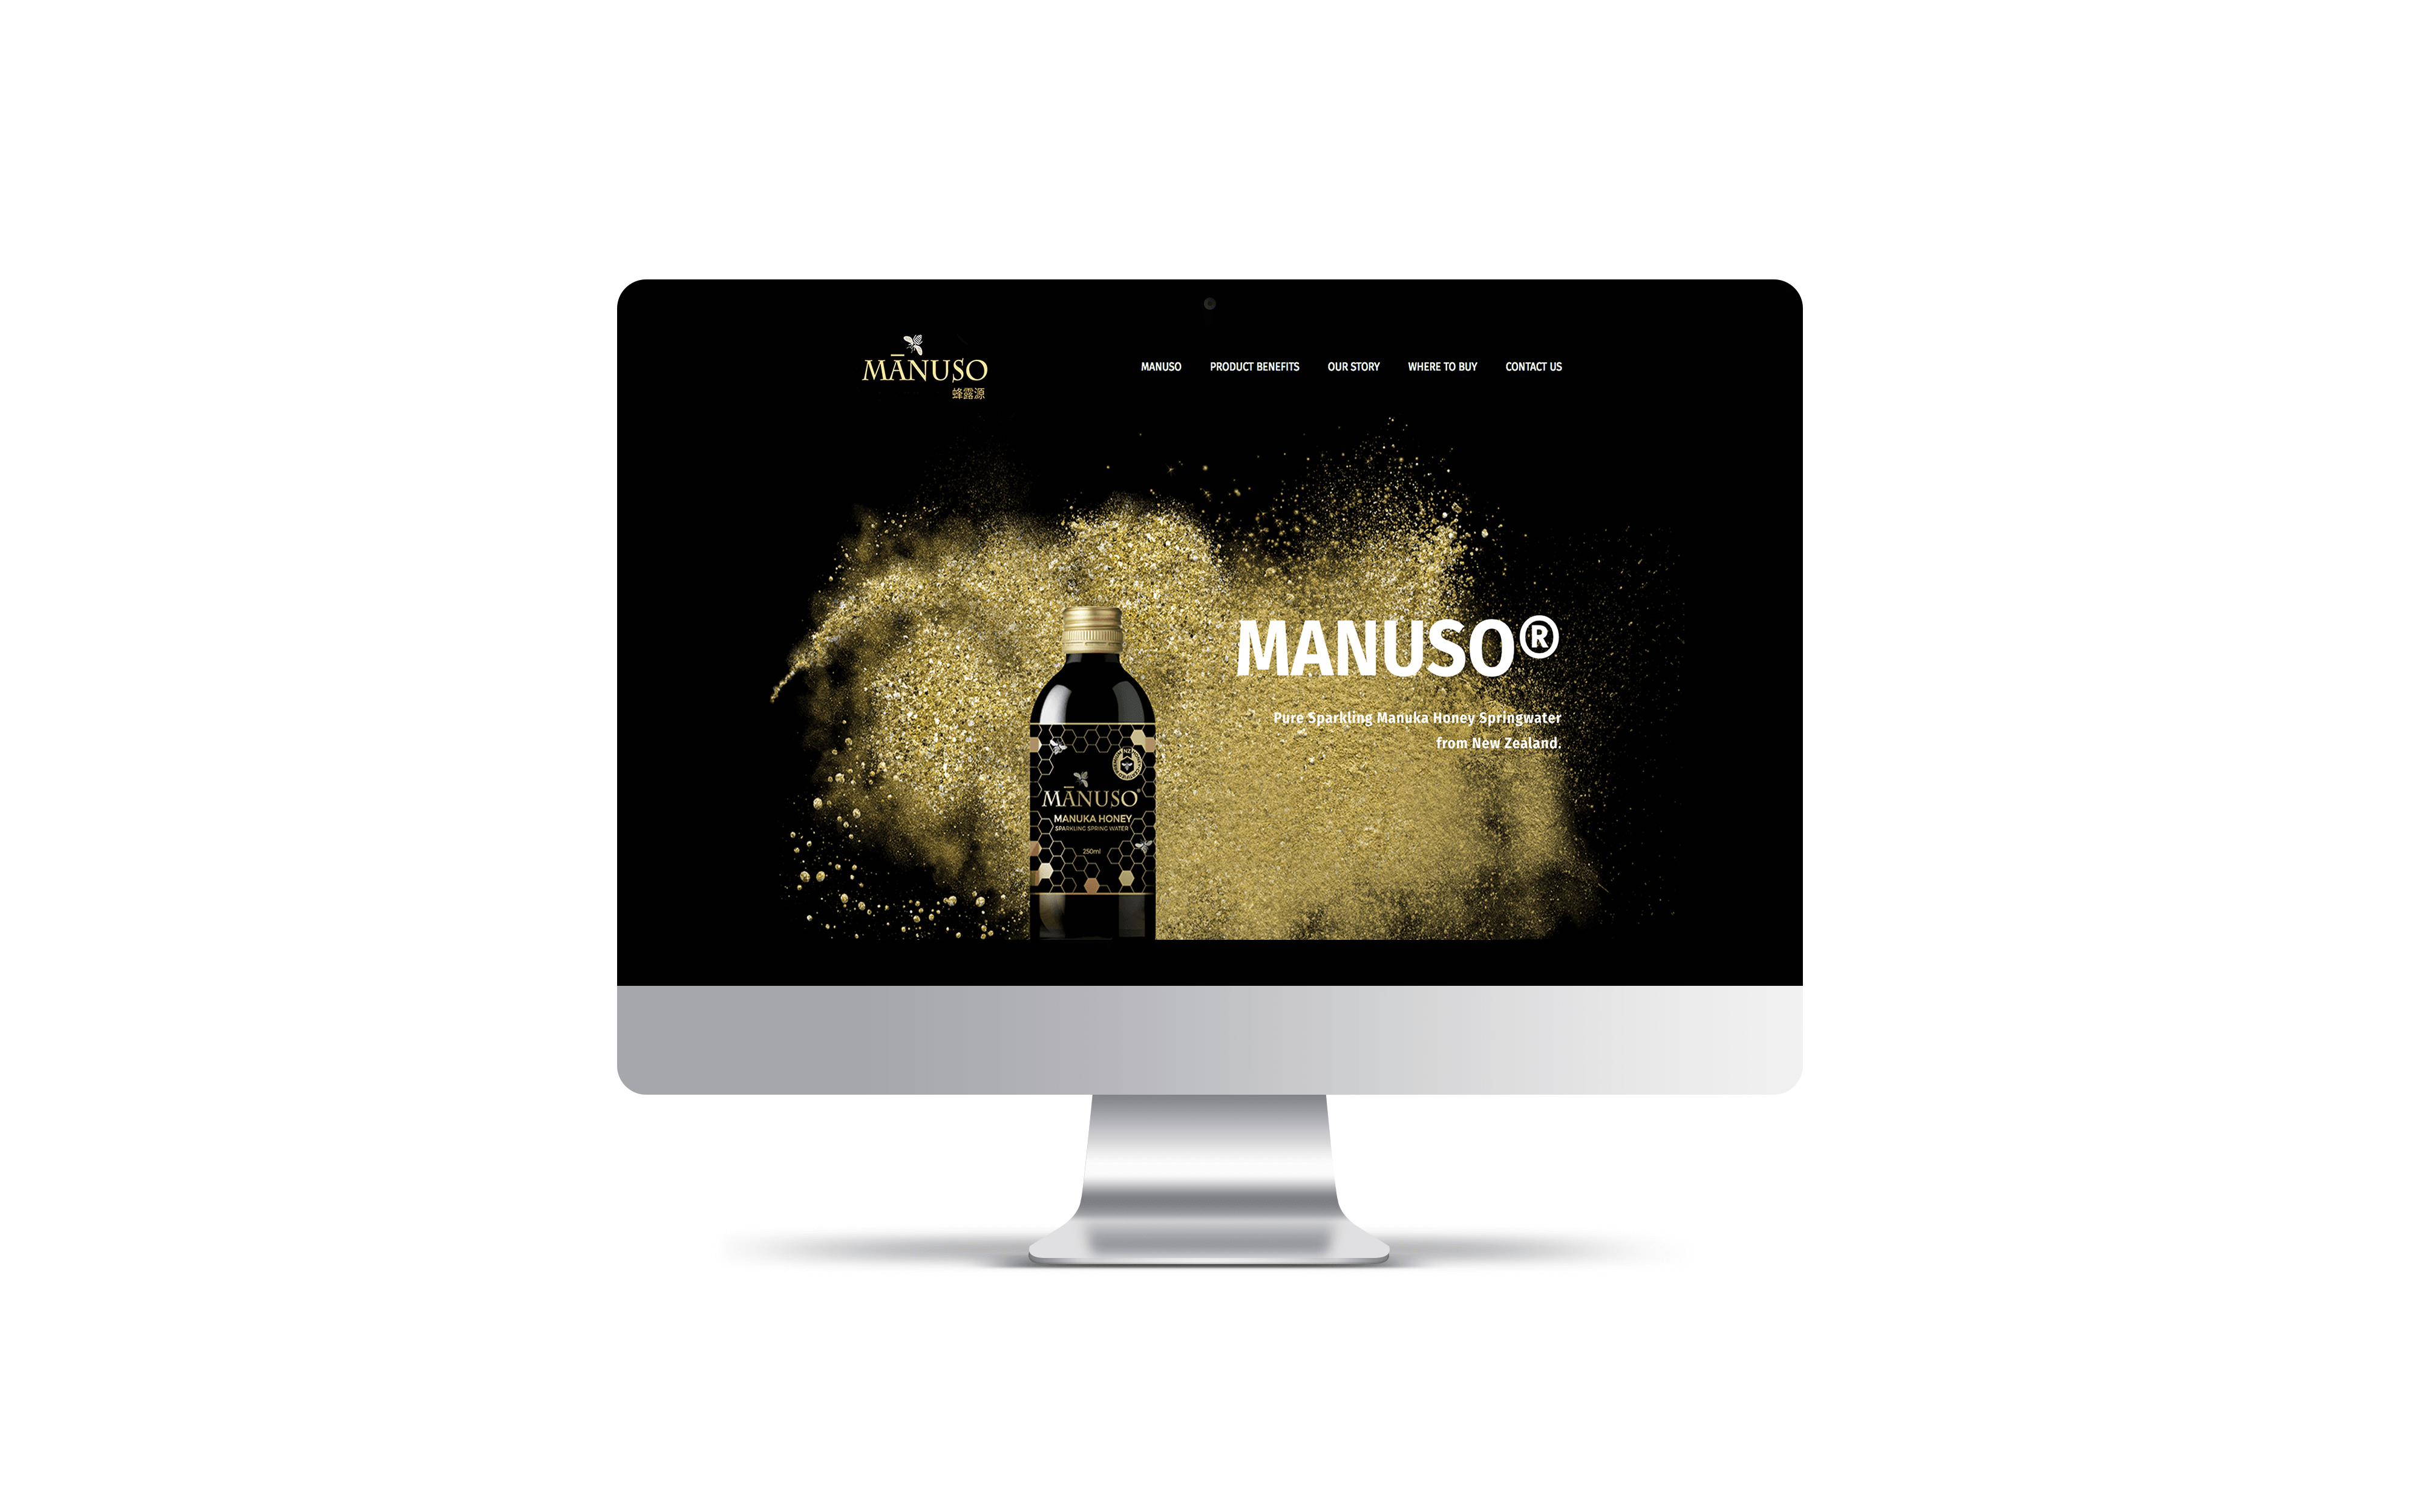 Website: Manuso